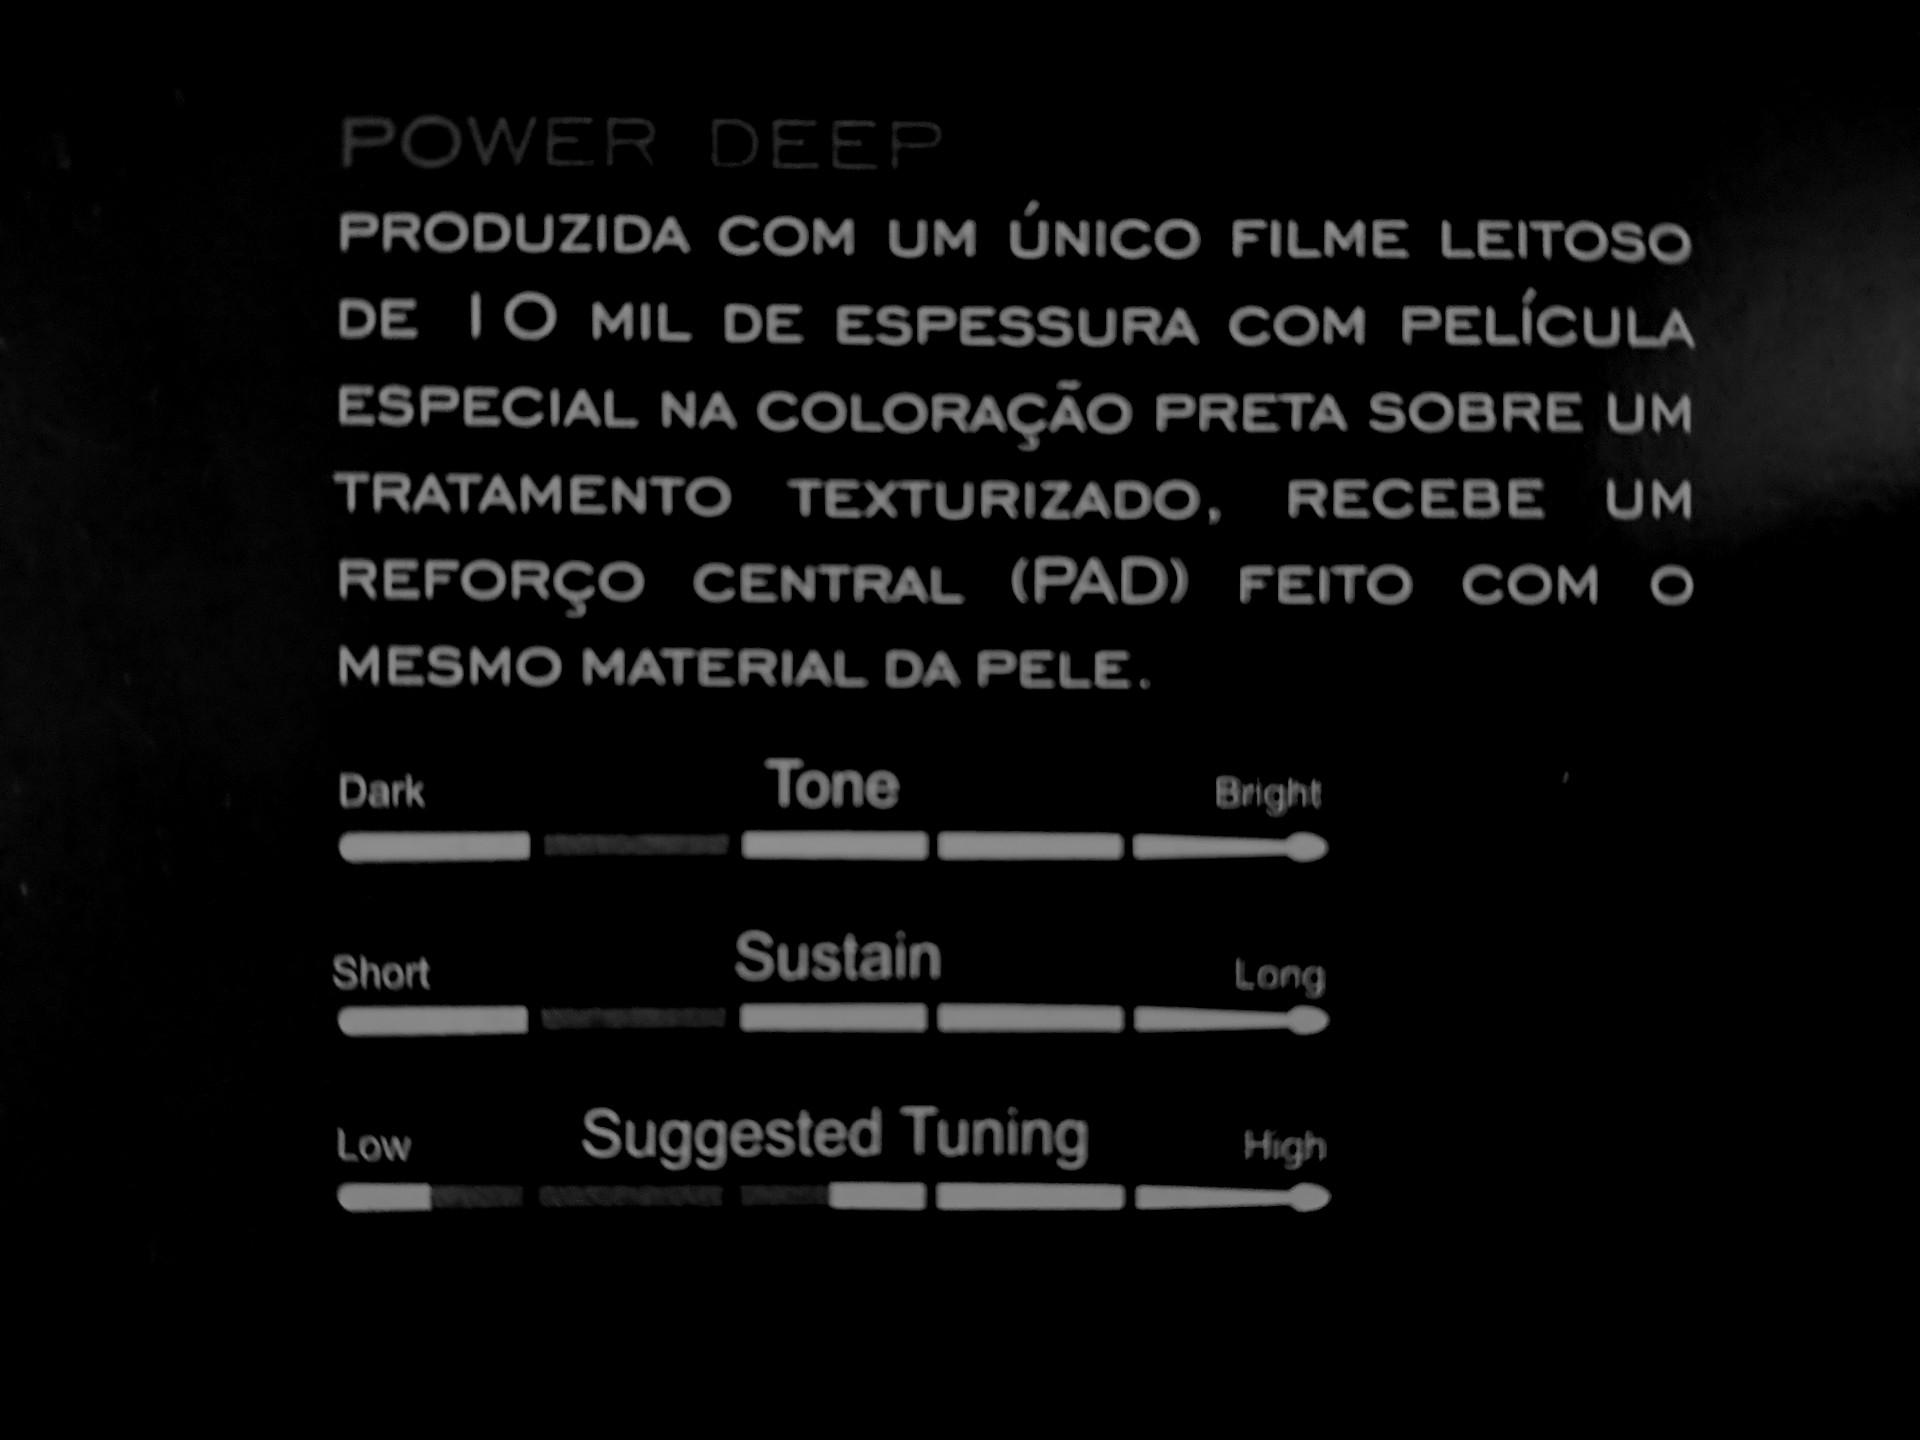 "Pele texturizada POWER DEEP C/ PAD 18"" ARO FINO Dudu Portes, LUEN."